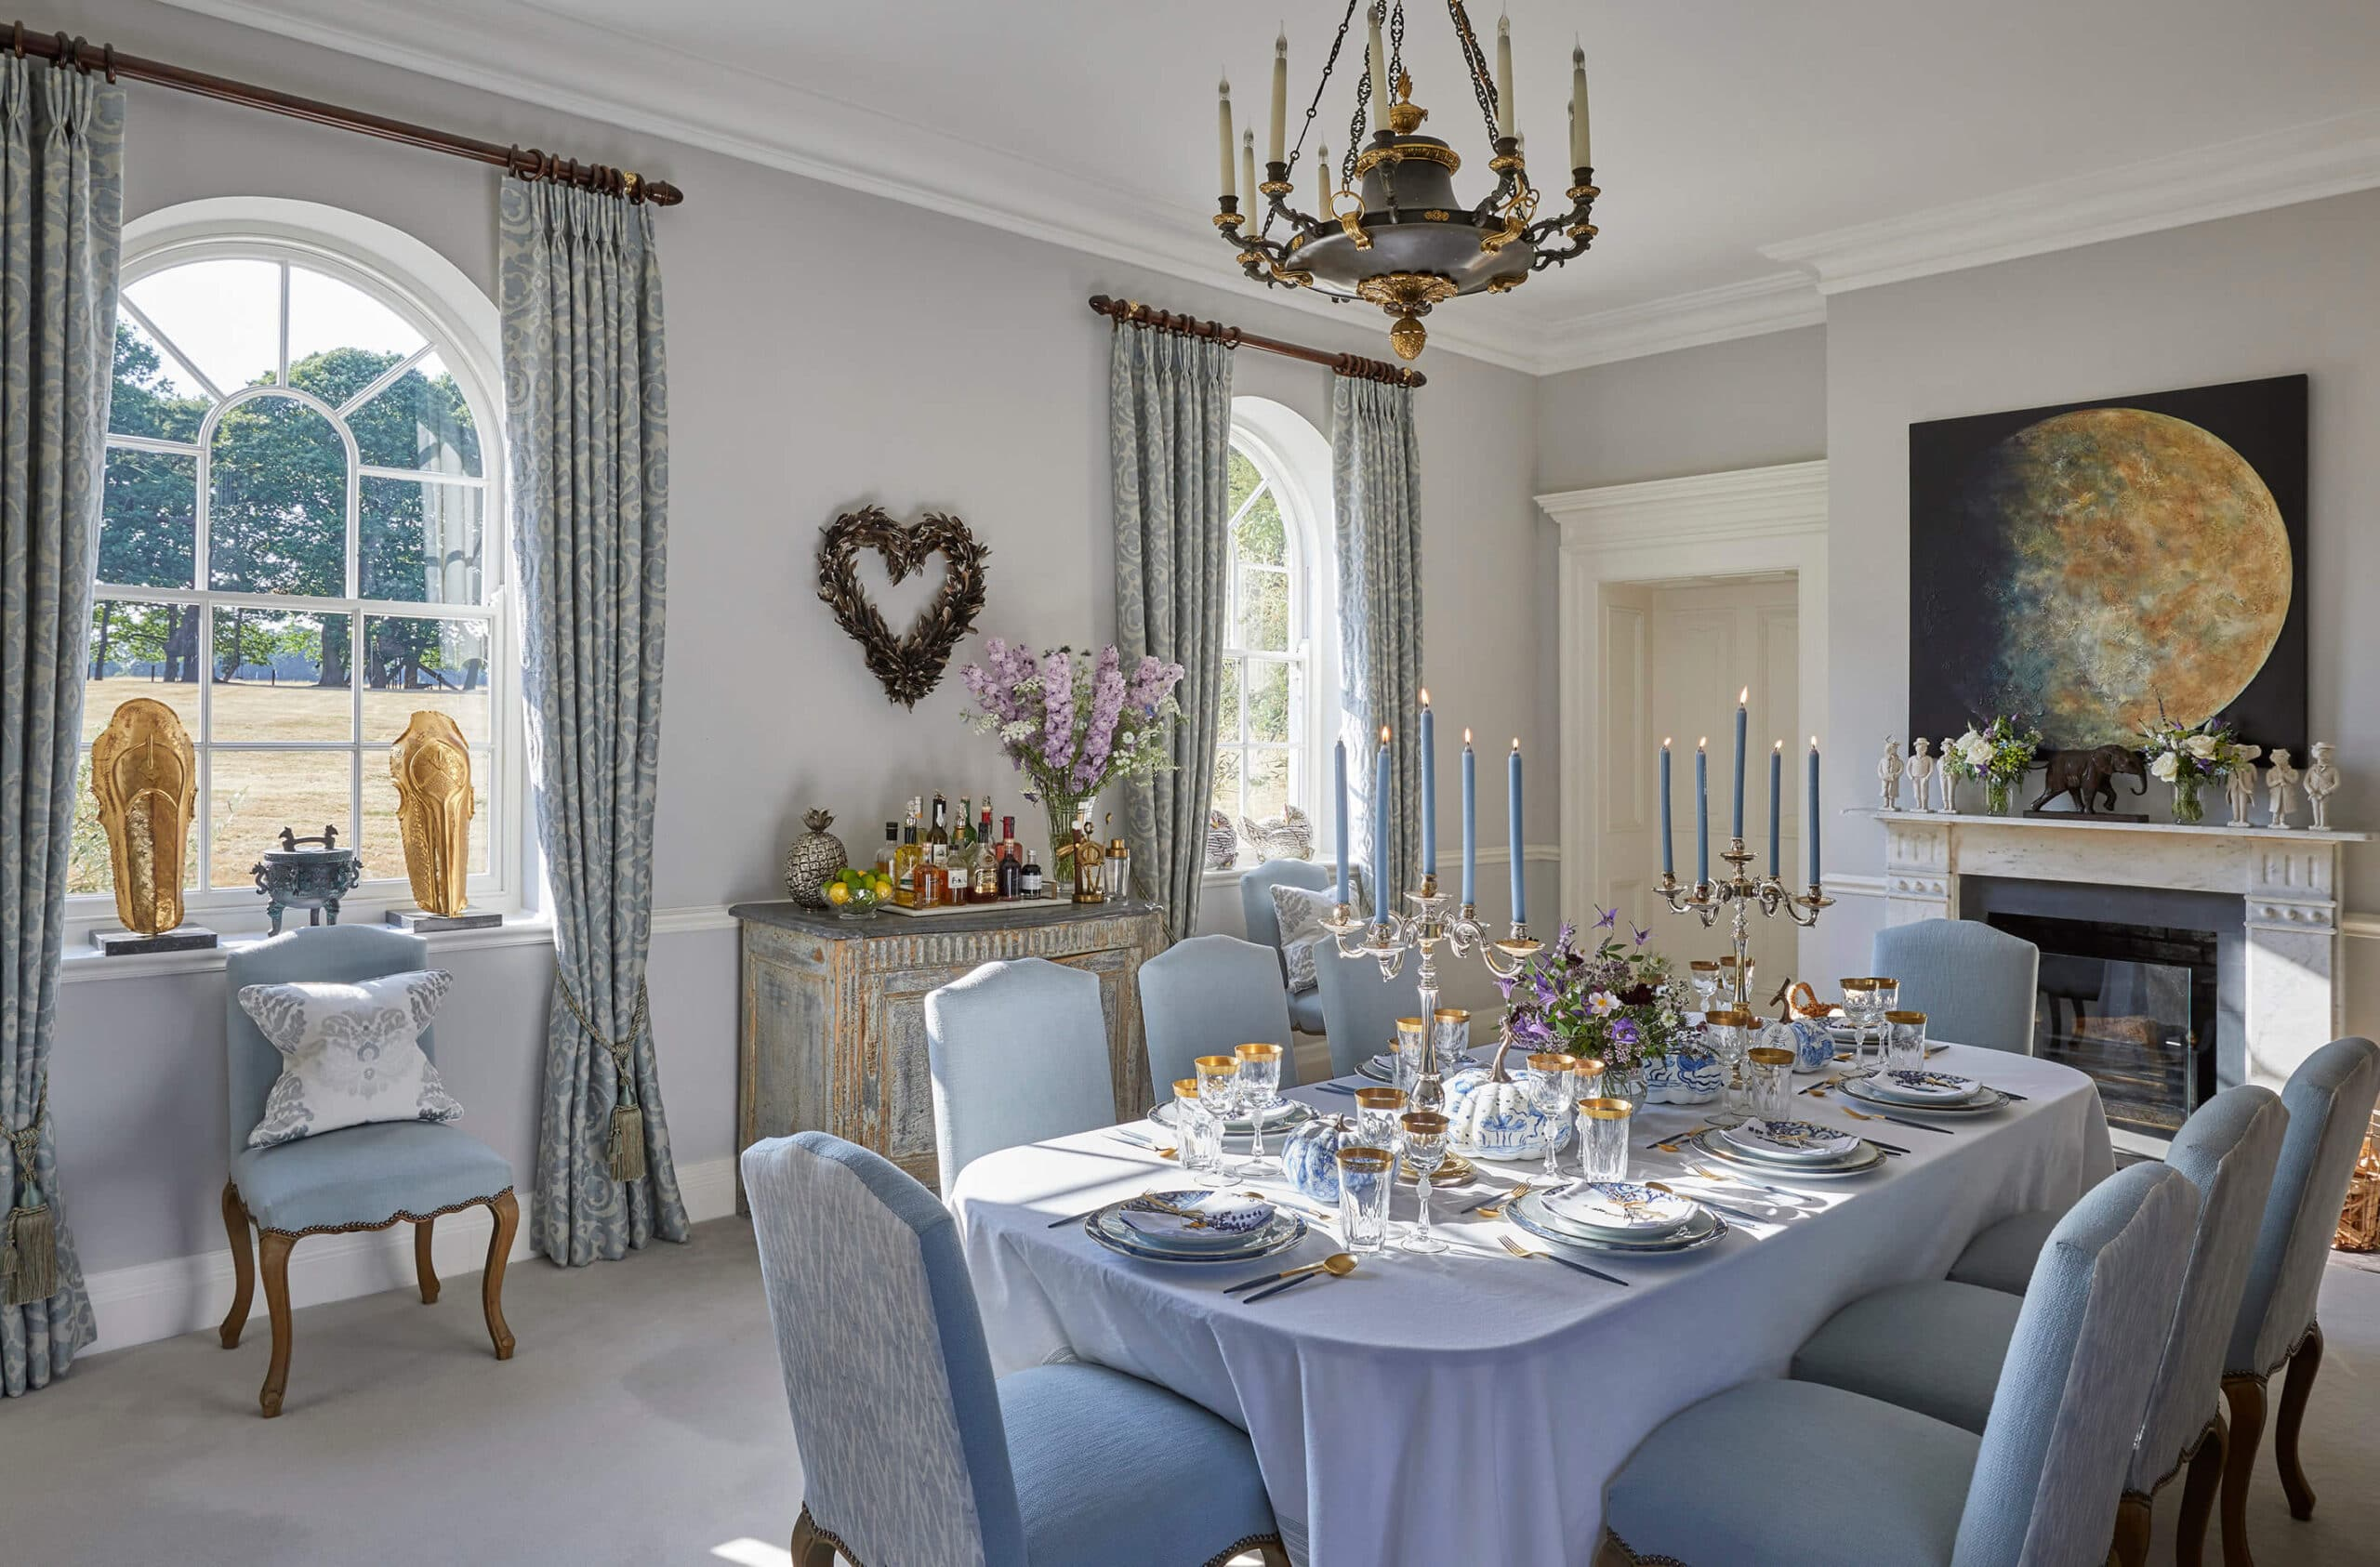 Luxury country home interior design